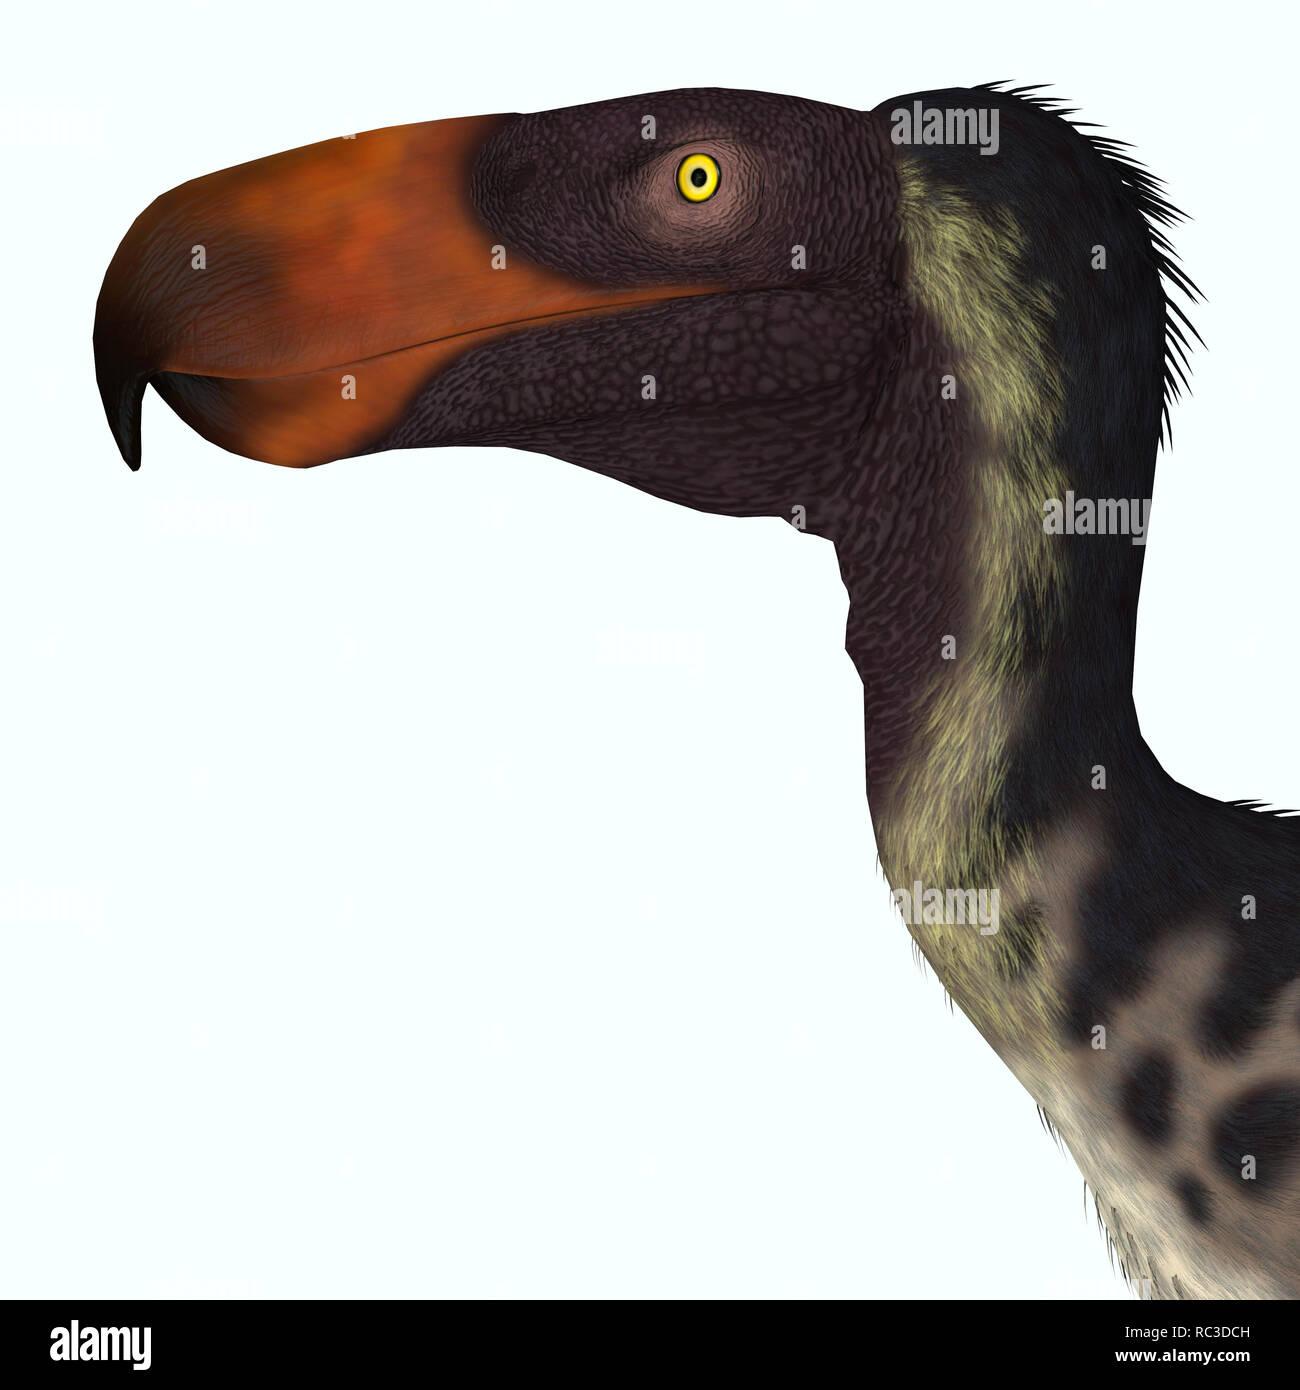 Kelenken Bird - Kelenken was a carnivorous 'Terror bird' that lived in Argentina during the Miocene Period. - Stock Image